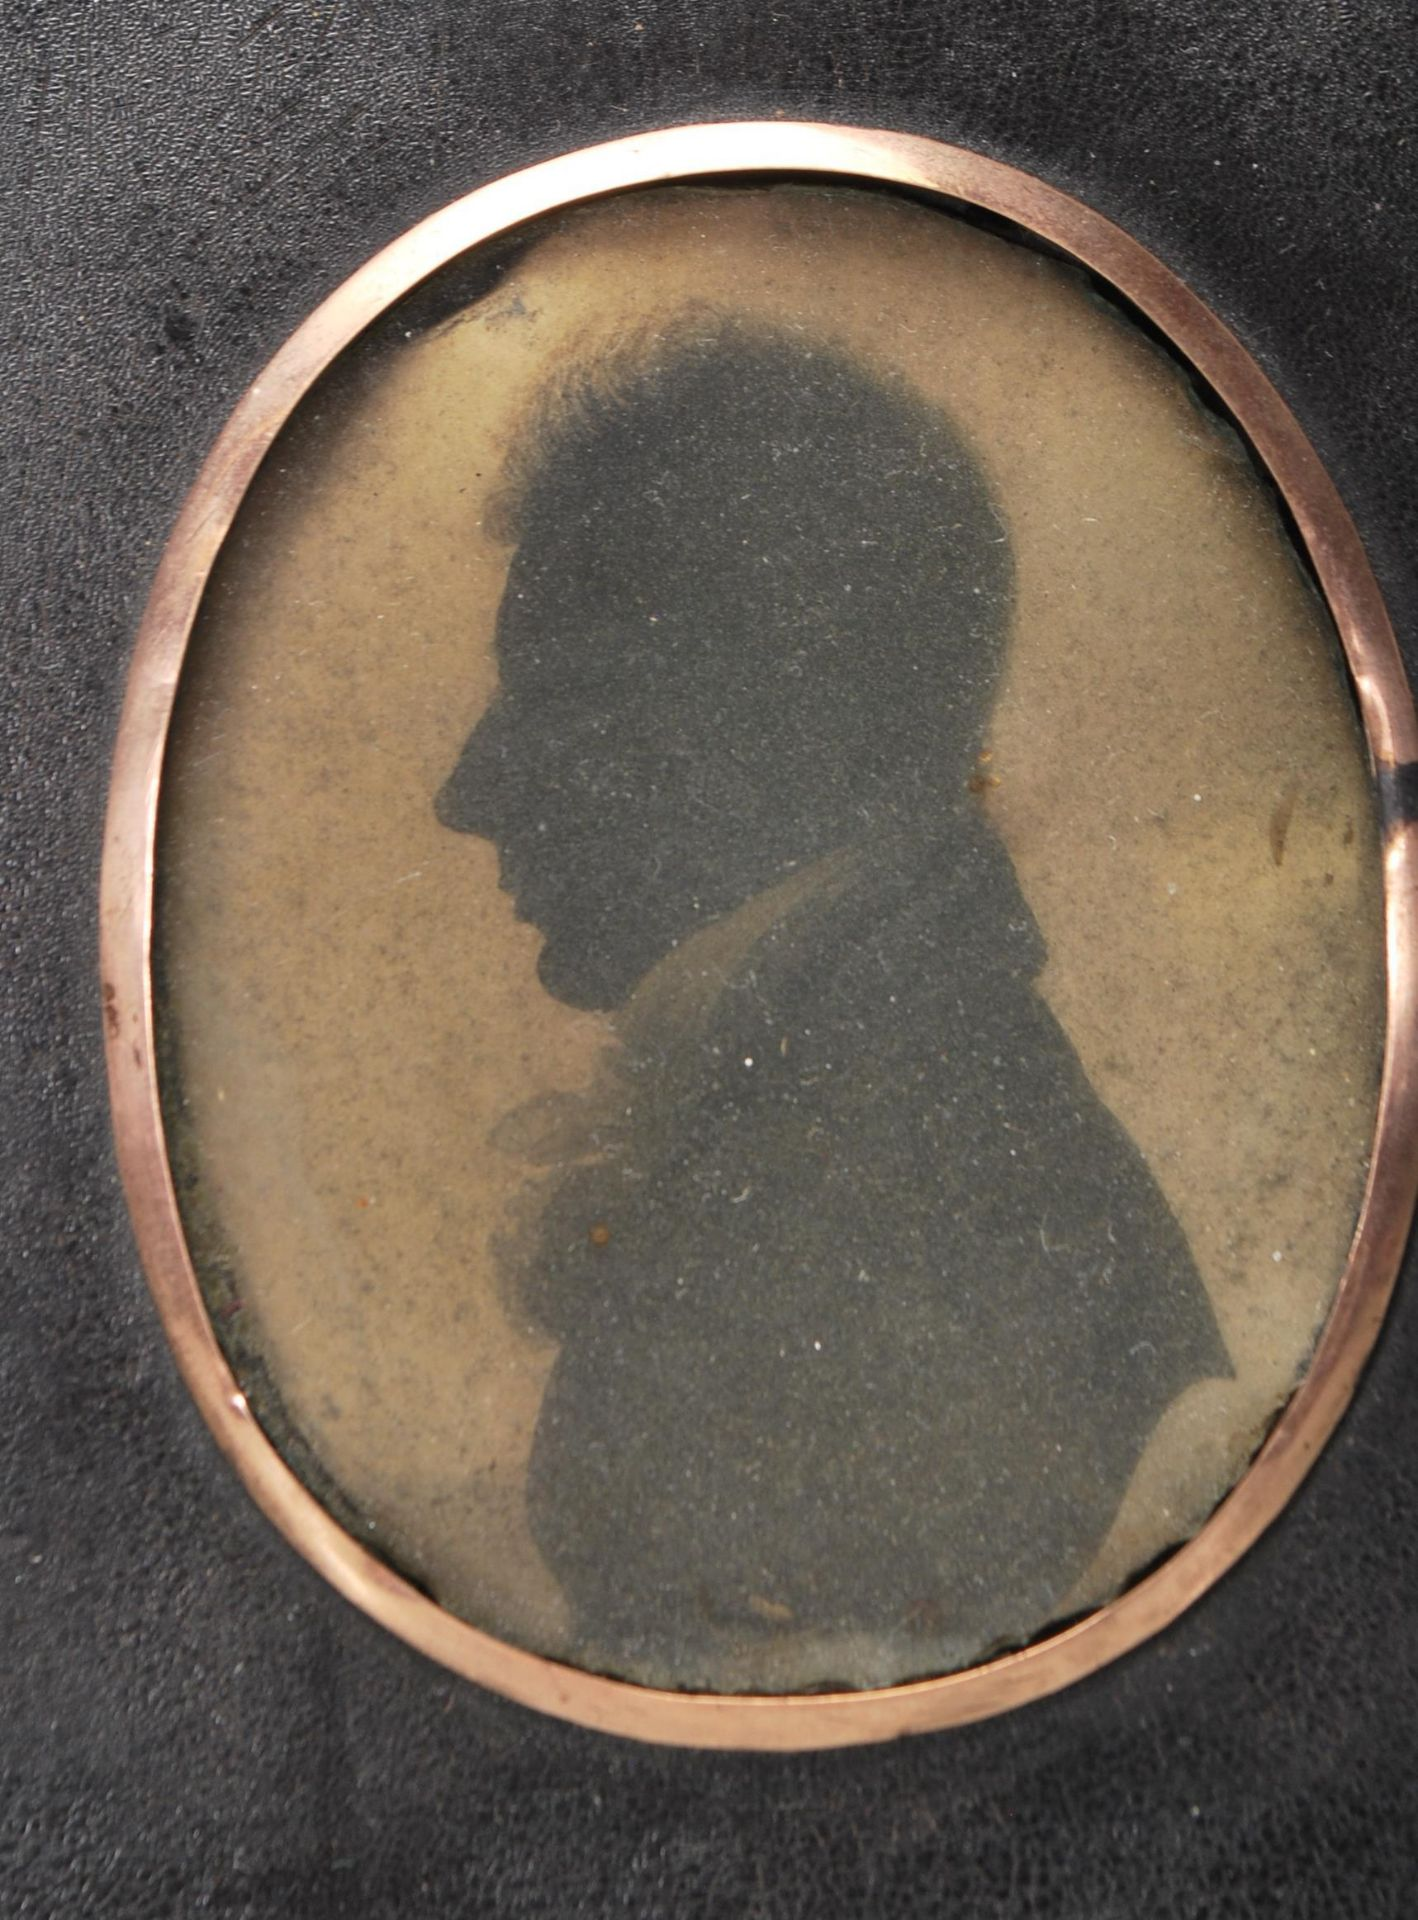 PAIR OF VICTORIAN 19TH CENTURY SIDE PORTRAITS / PORTRAIT MINIATURE - Image 3 of 4